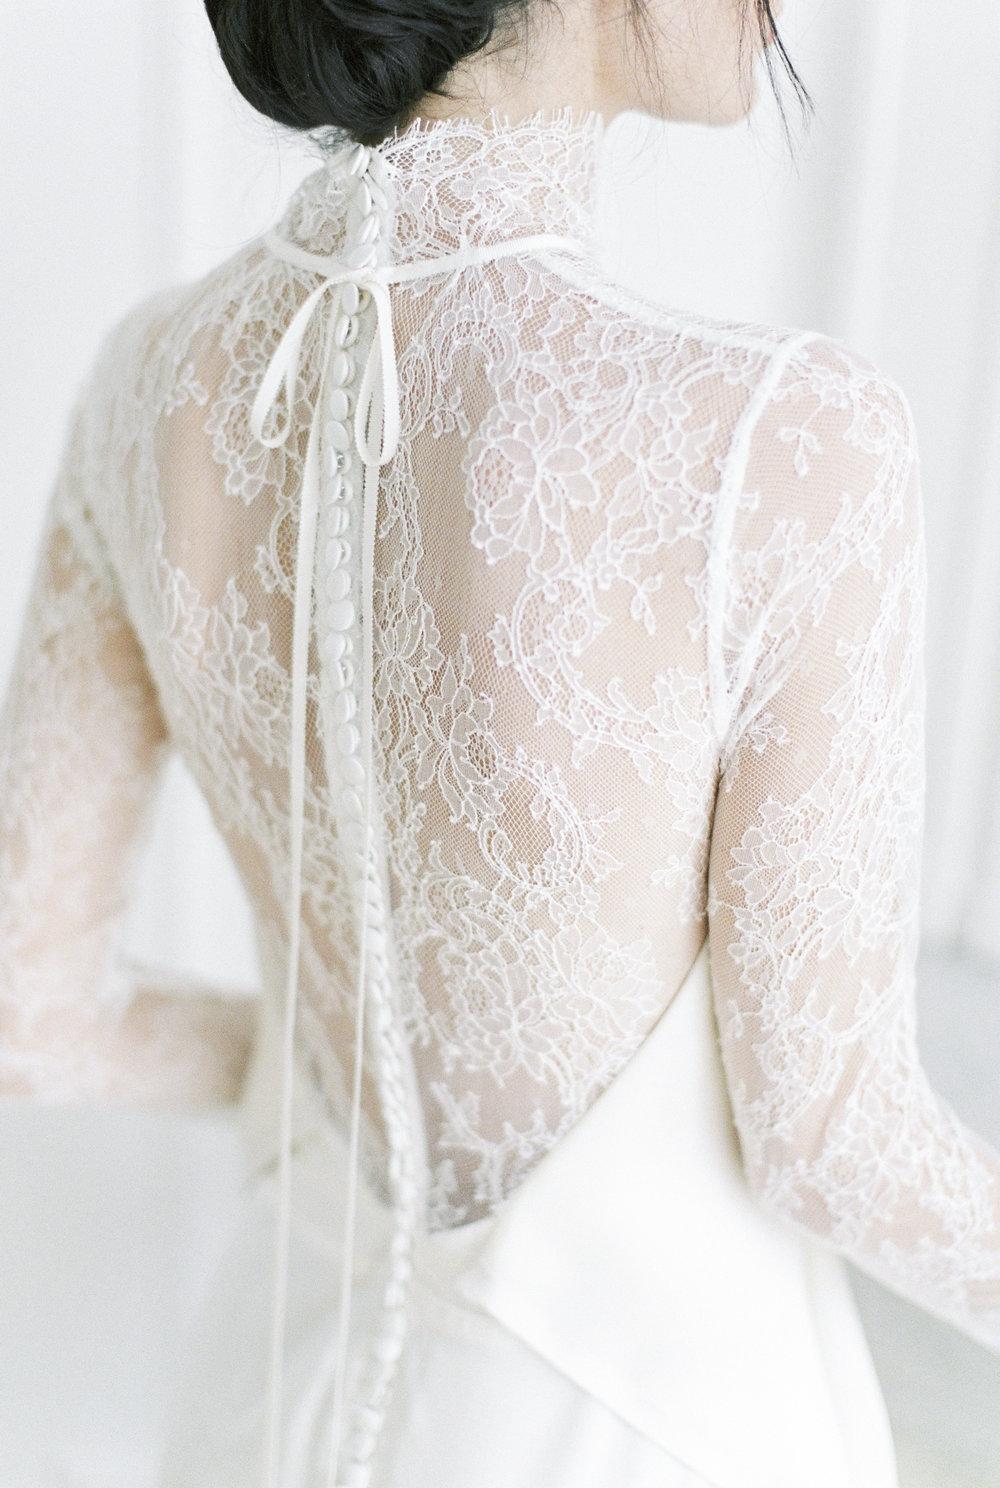 Ludovic Grau-Mingot - Film Photographer - Talitha - Wedding dresses - Collection 2019-284.jpg